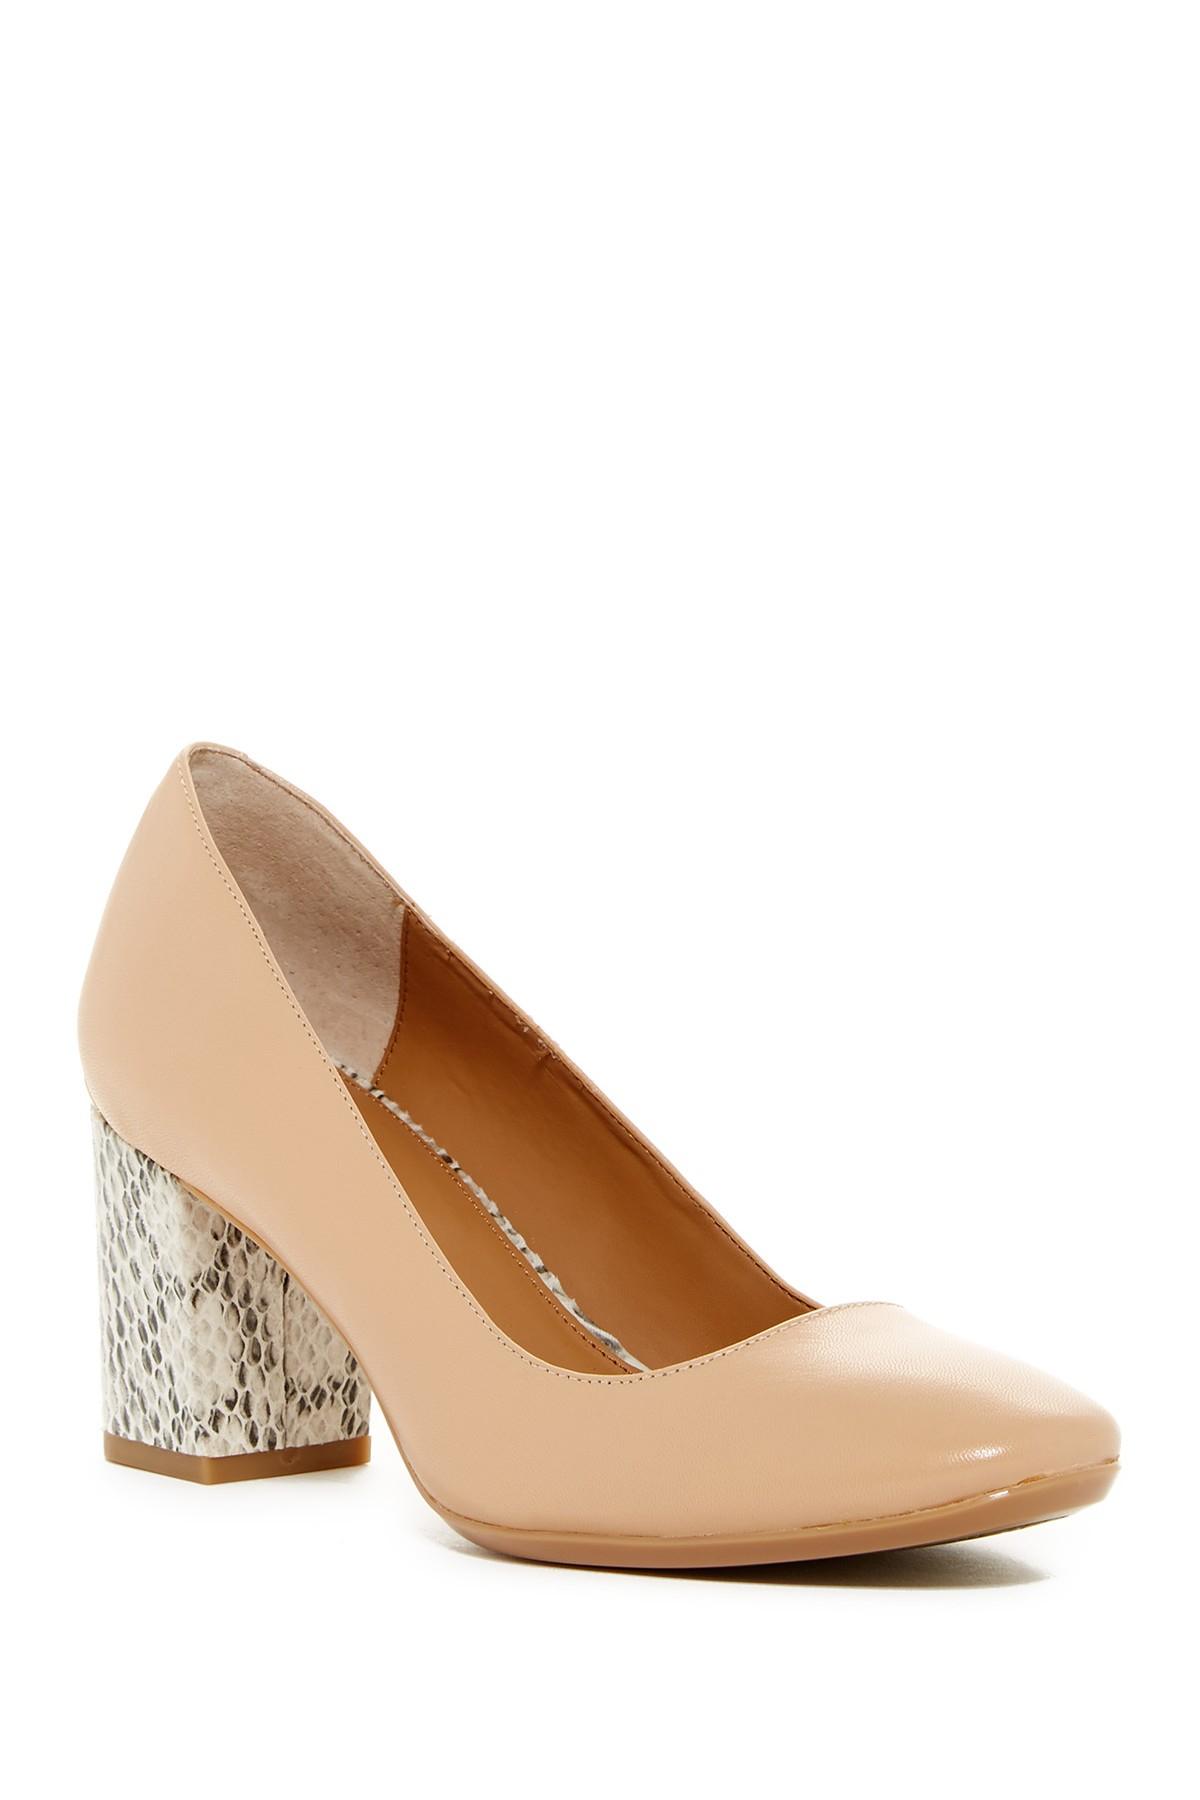 21715faae4 Lyst - Calvin Klein Cirilla Block Heel Pump in Brown